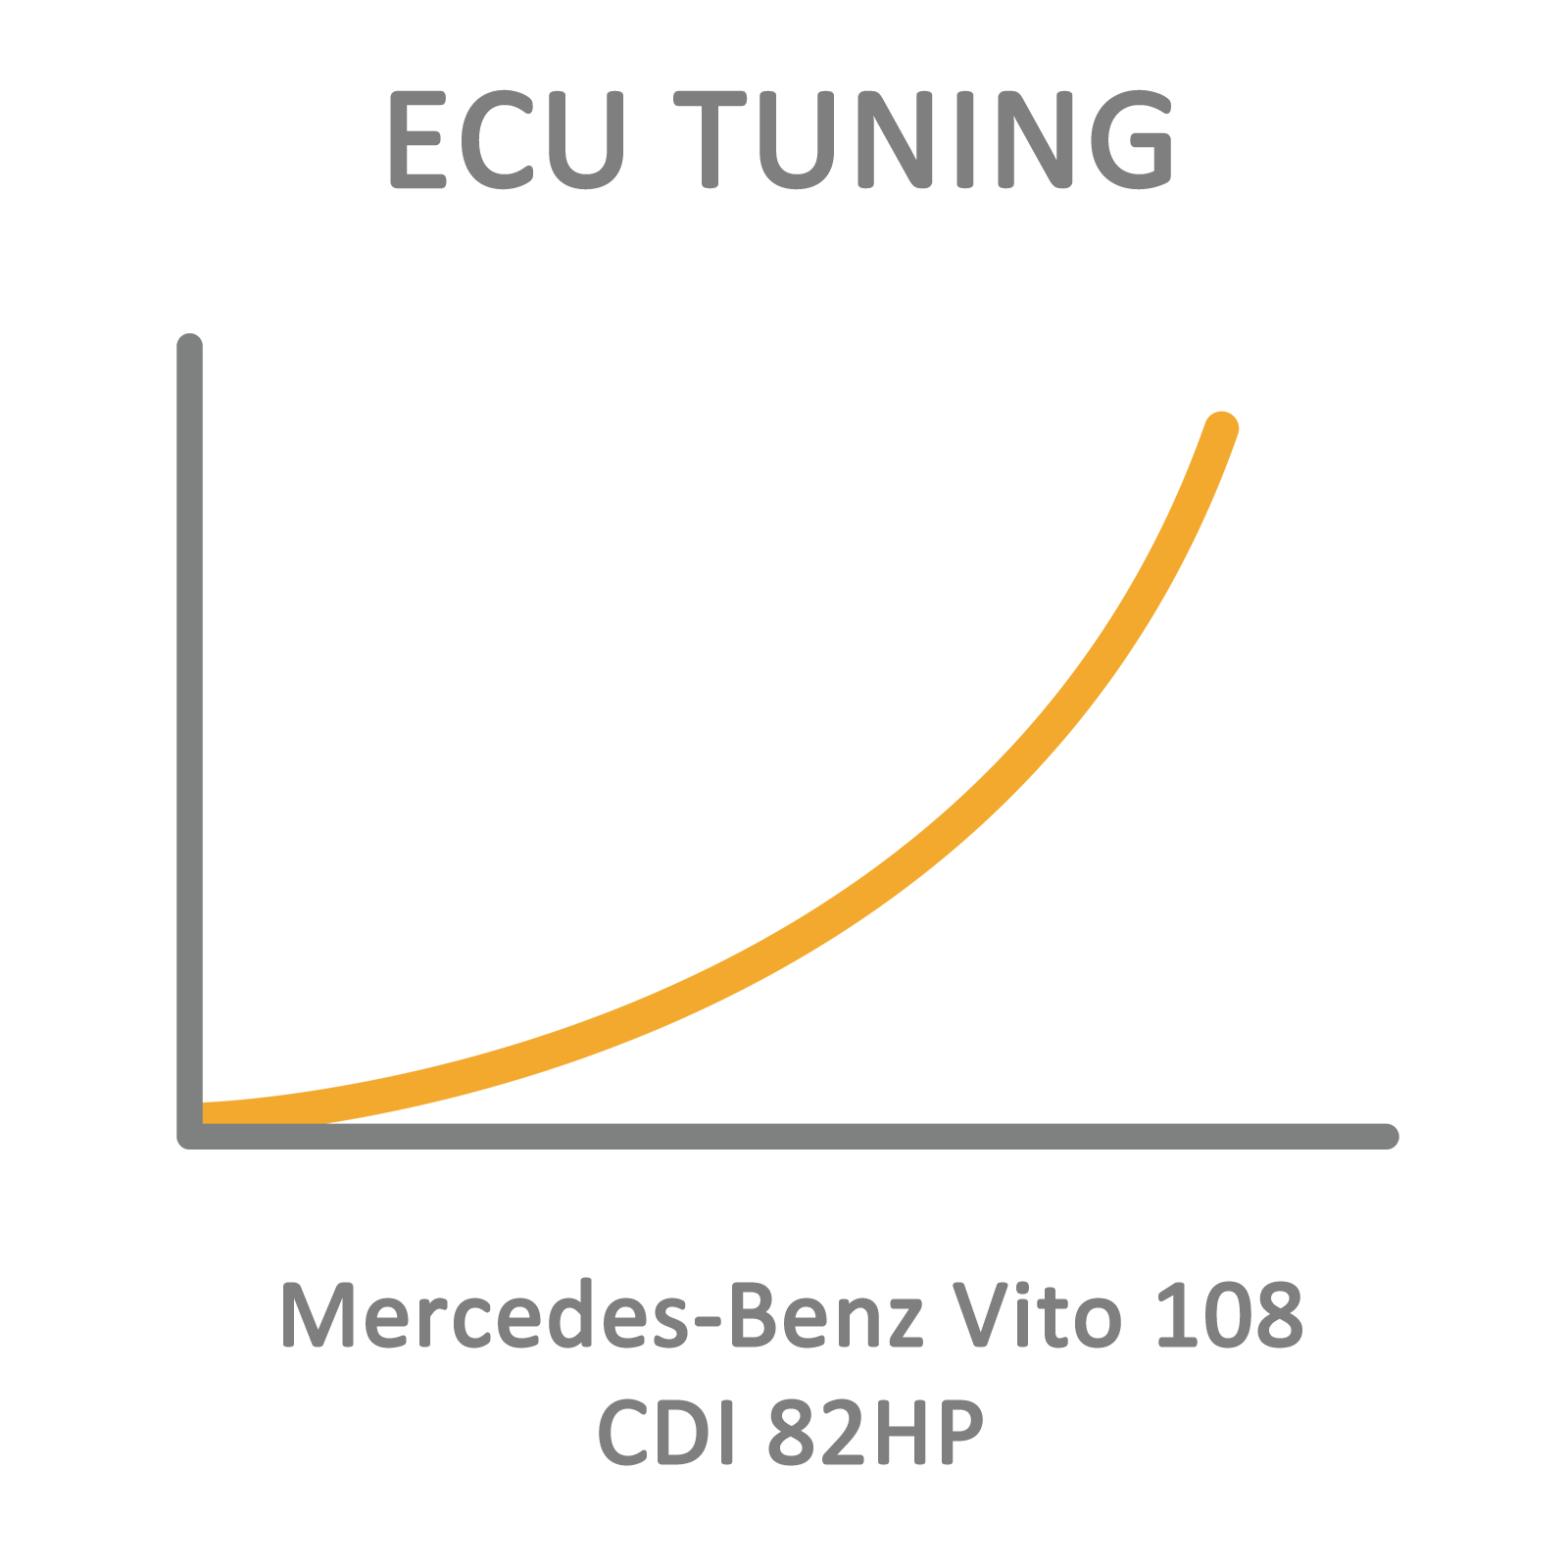 Mercedes-Benz Vito 108 CDI 82HP ECU Tuning Remapping